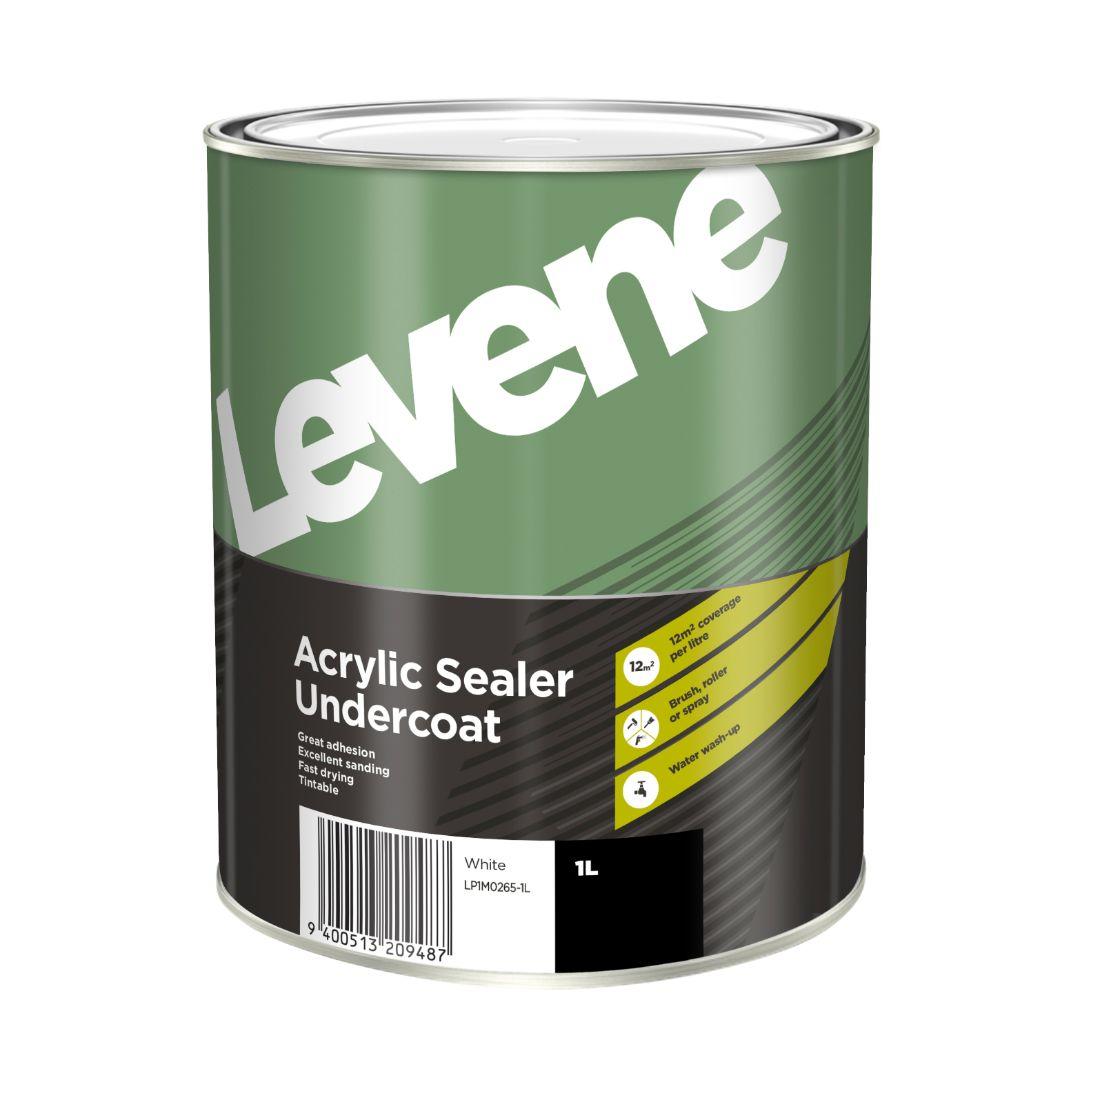 Acrylic Sealer Undercoat 1L